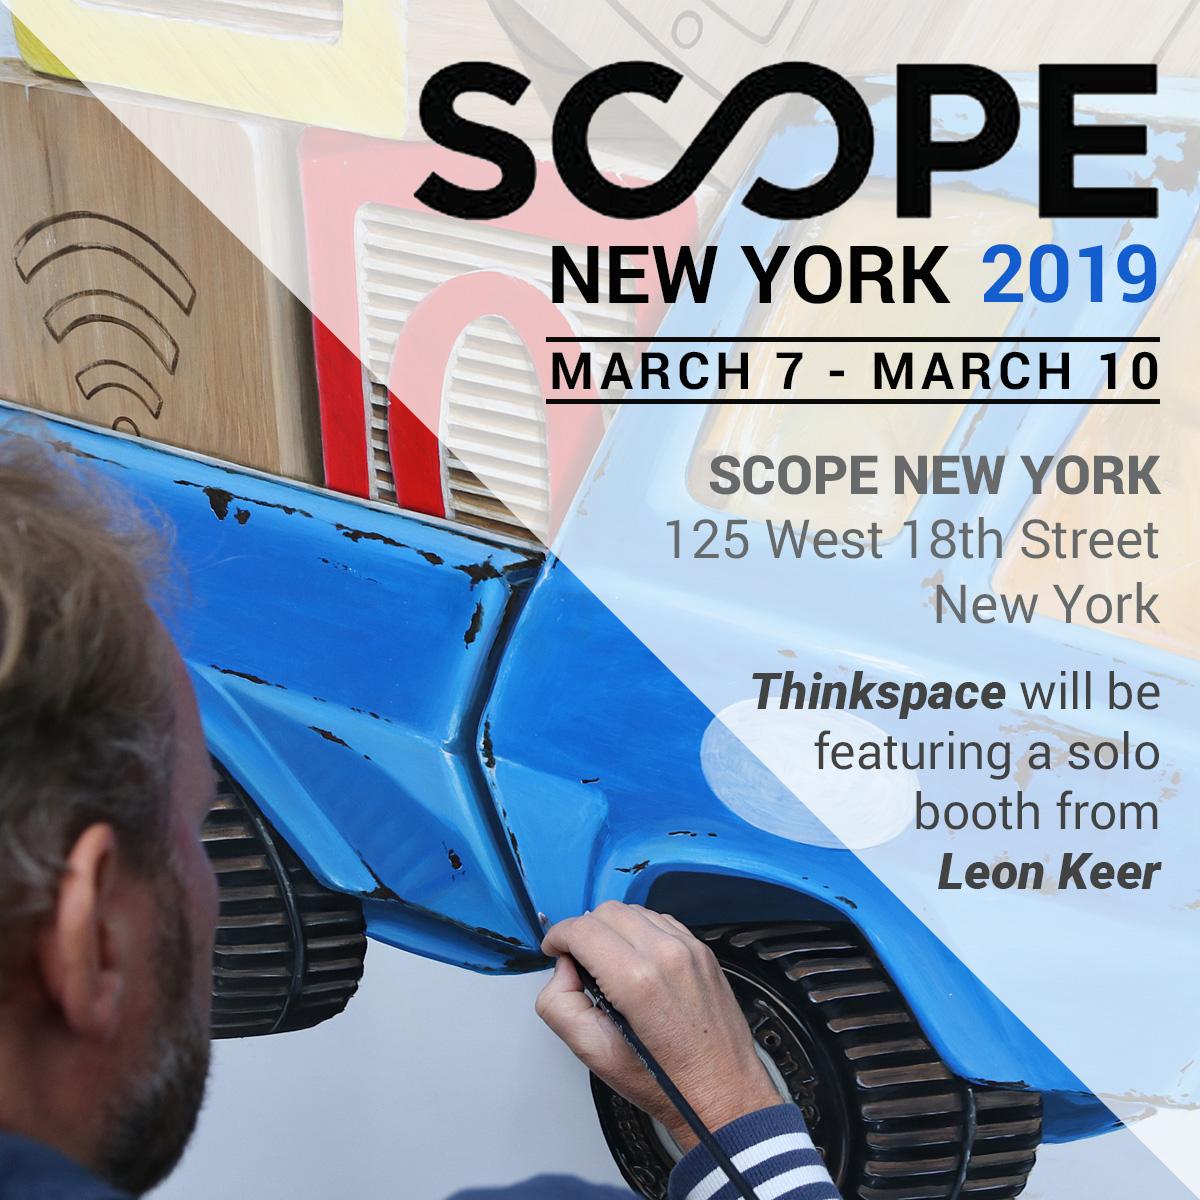 Scope New York Thinkspace Leon Keer